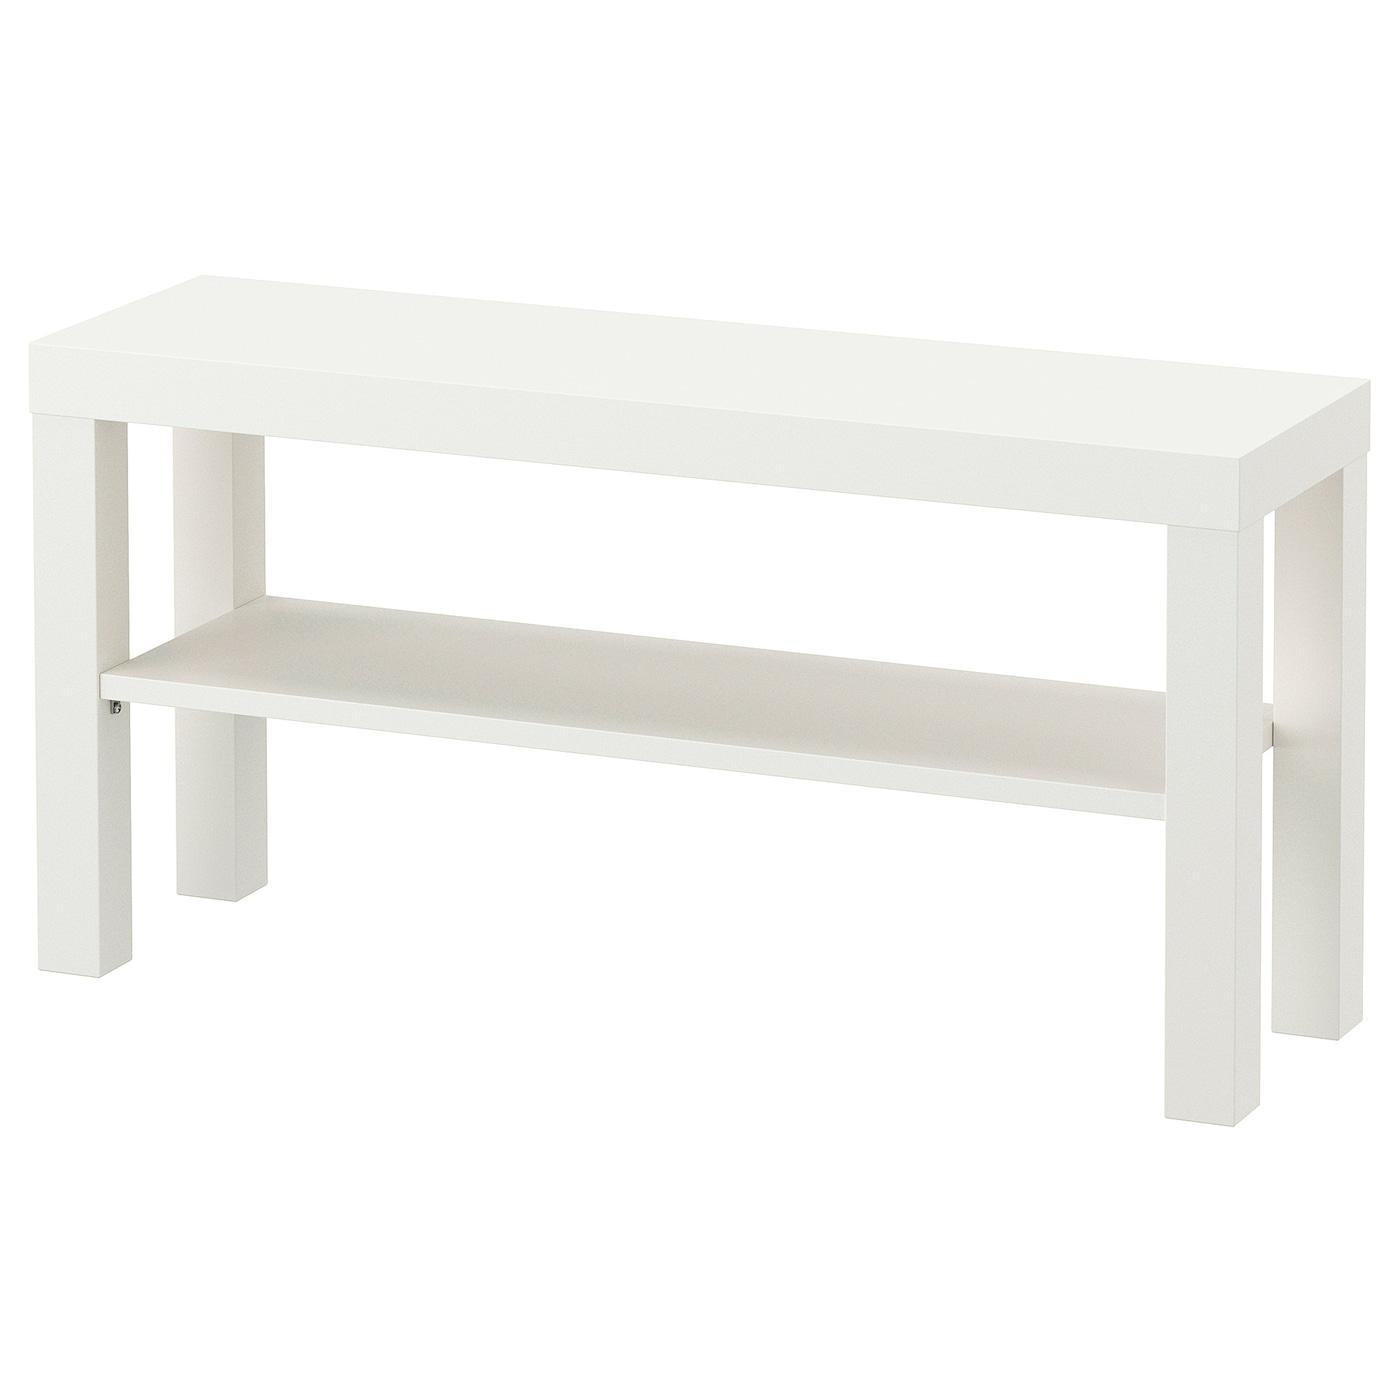 Lack Tv Bench White Ikea